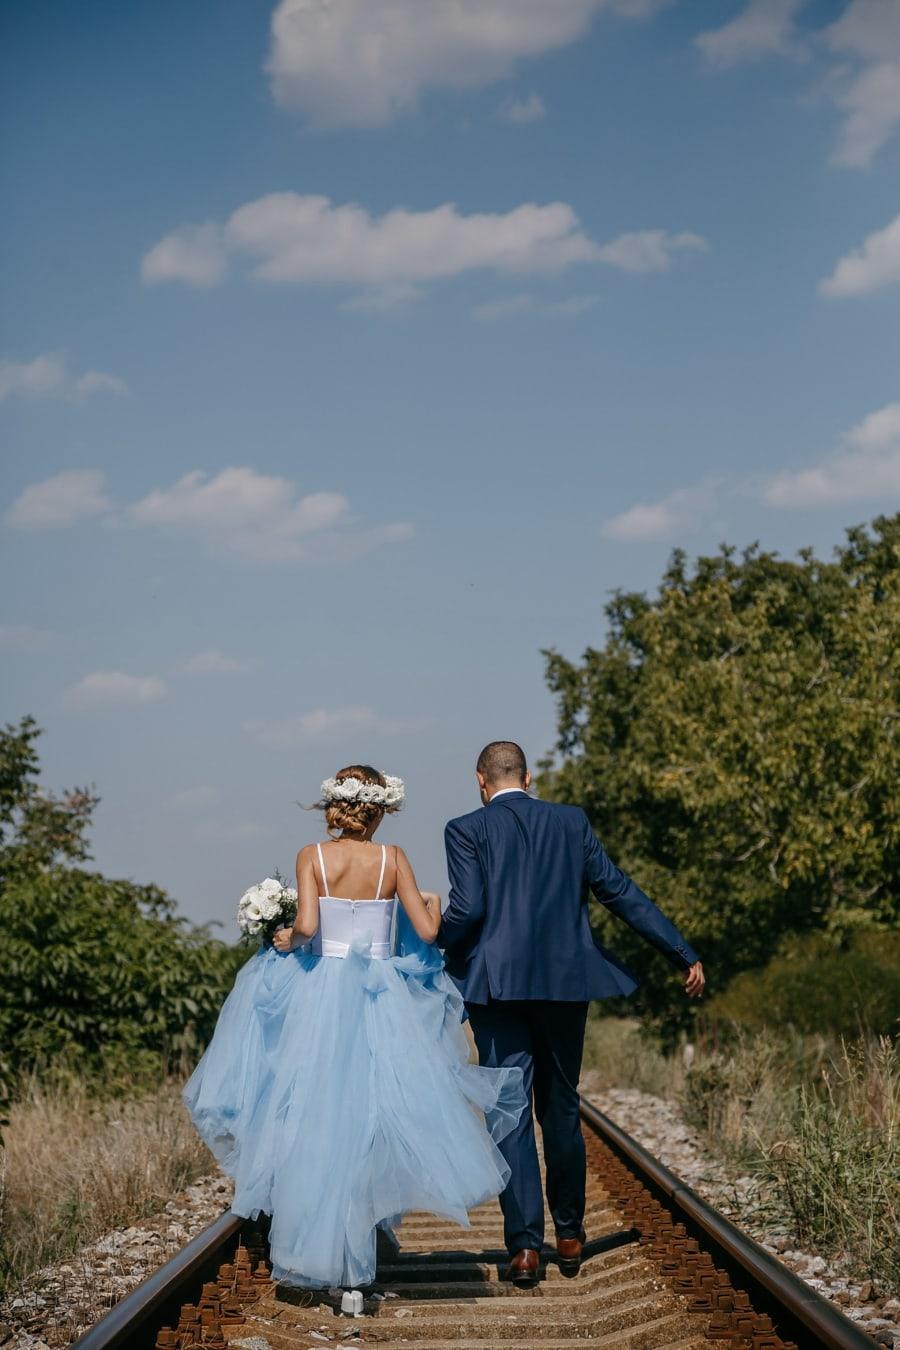 happiness, newlyweds, railway, railroad, wedding, bride, groom, dress, love, romance